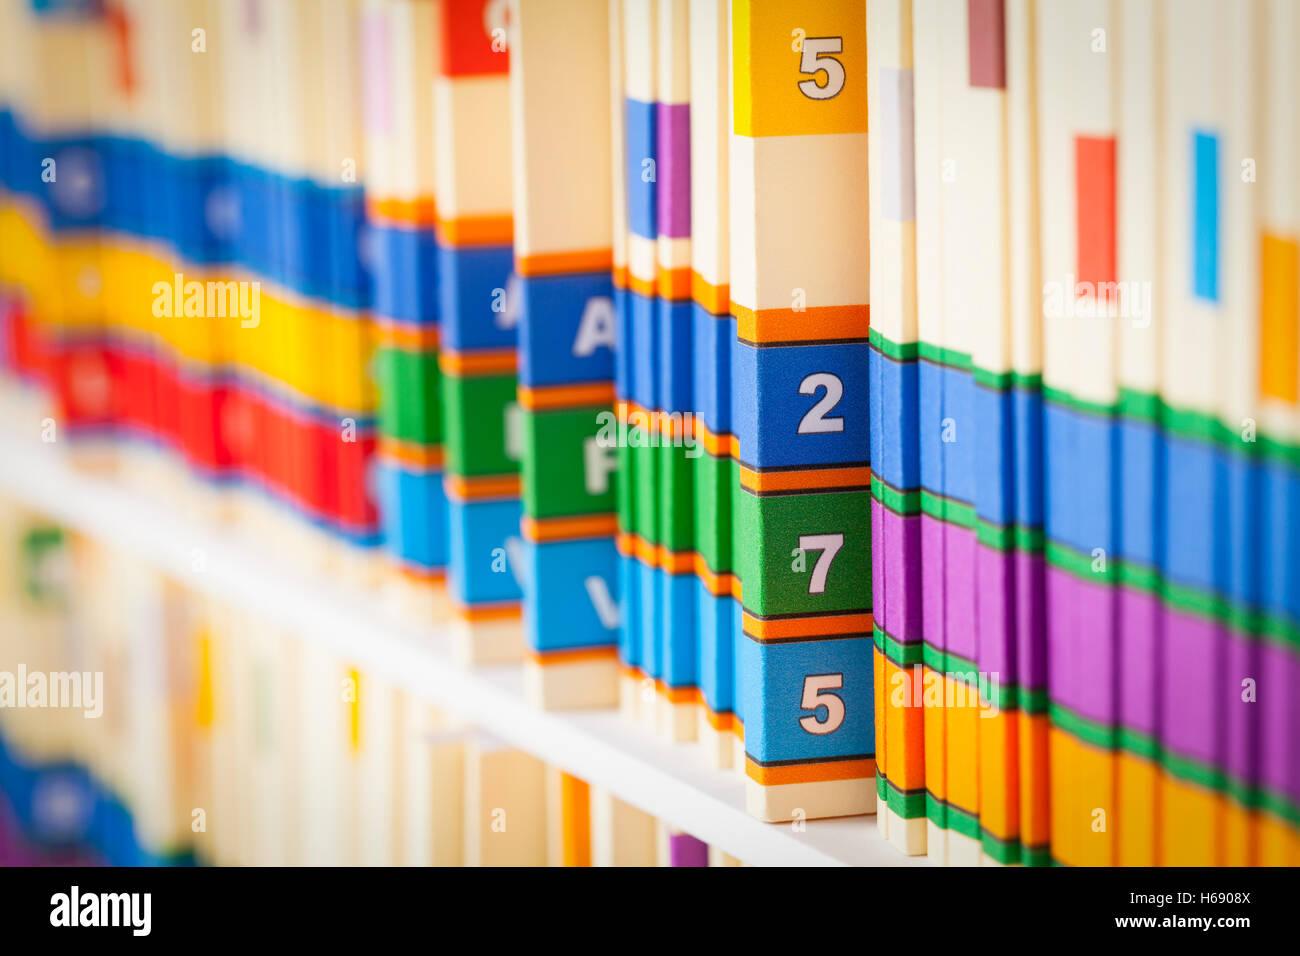 Regal von Patientenakten in Büroumgebung. Stockbild